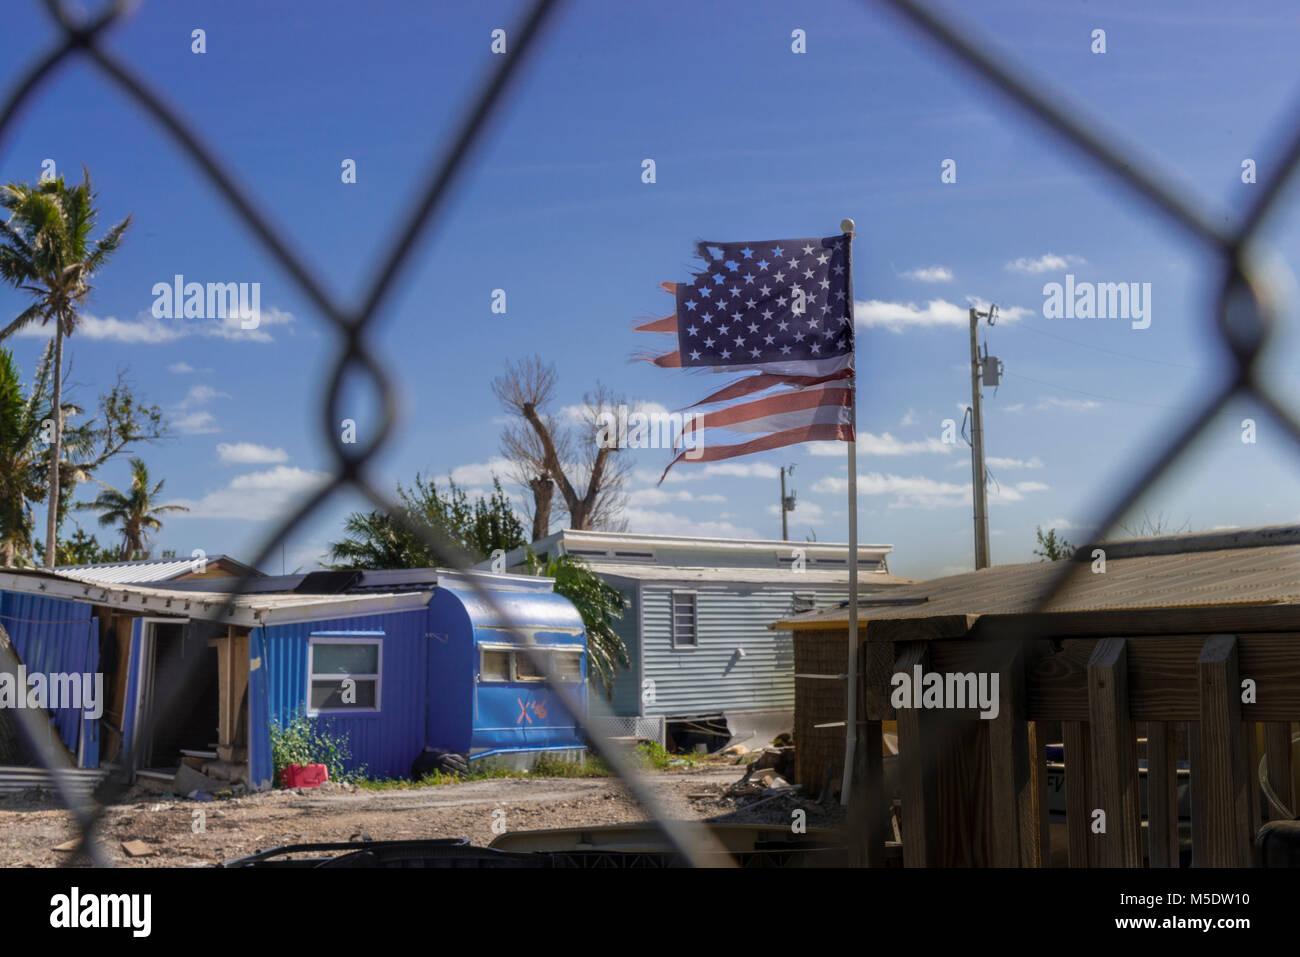 Hurricane Irma Storm Damage To Abandoned Trailer Park, Islamorada, Florida, USA Stock Photo